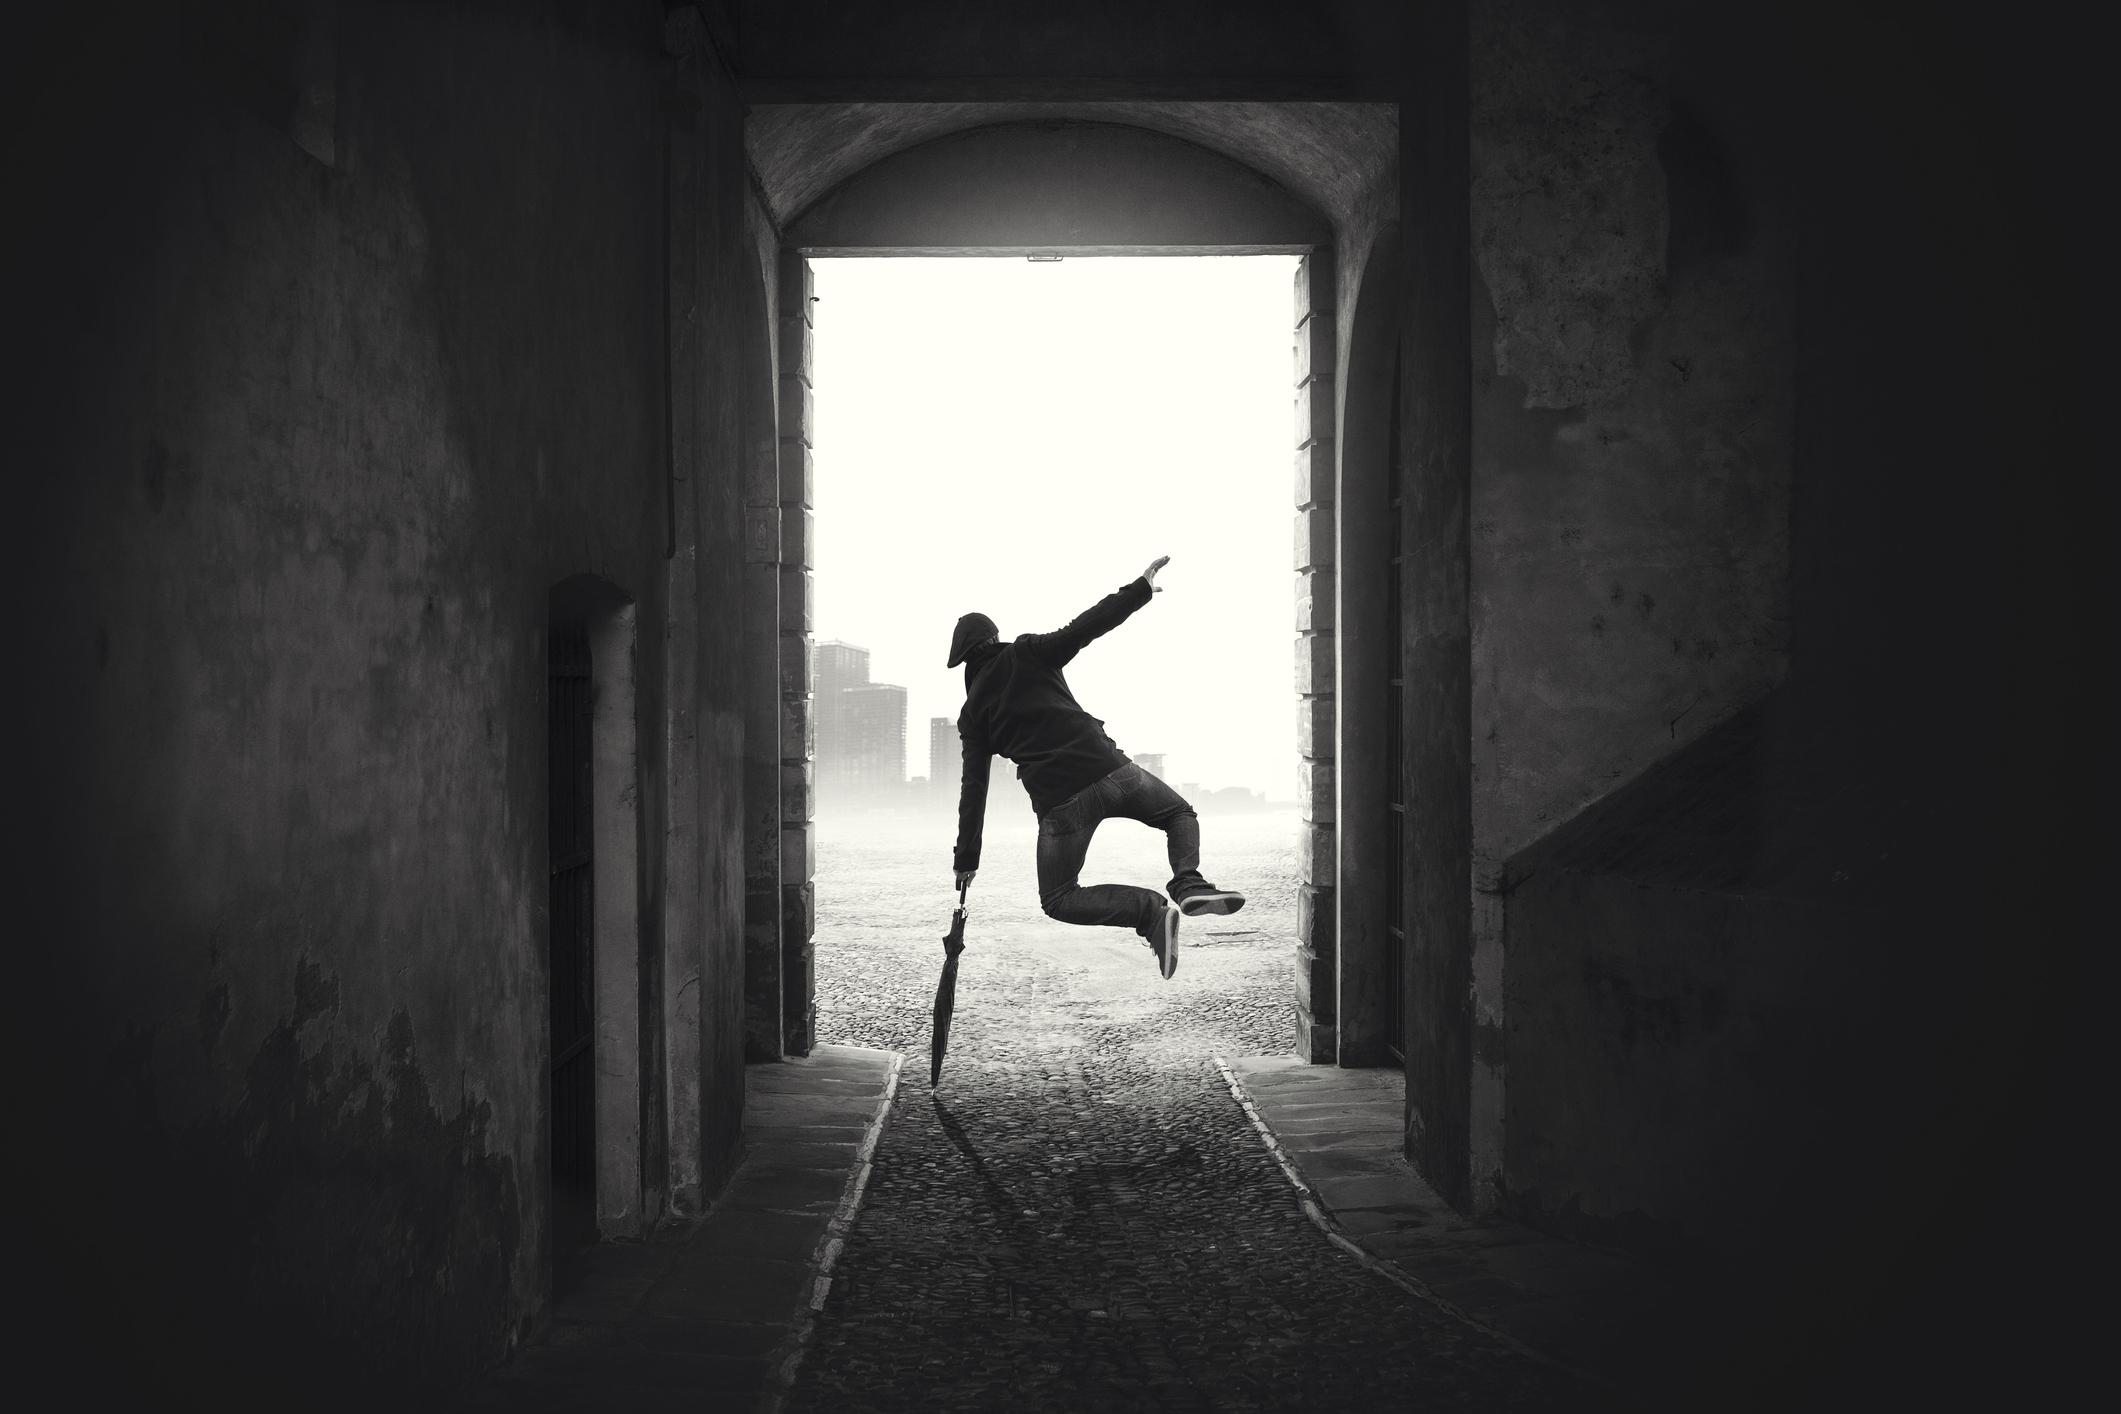 happy-man-jumping-happy-despite-the-bad-weather-865676550_2125x1416.jpeg